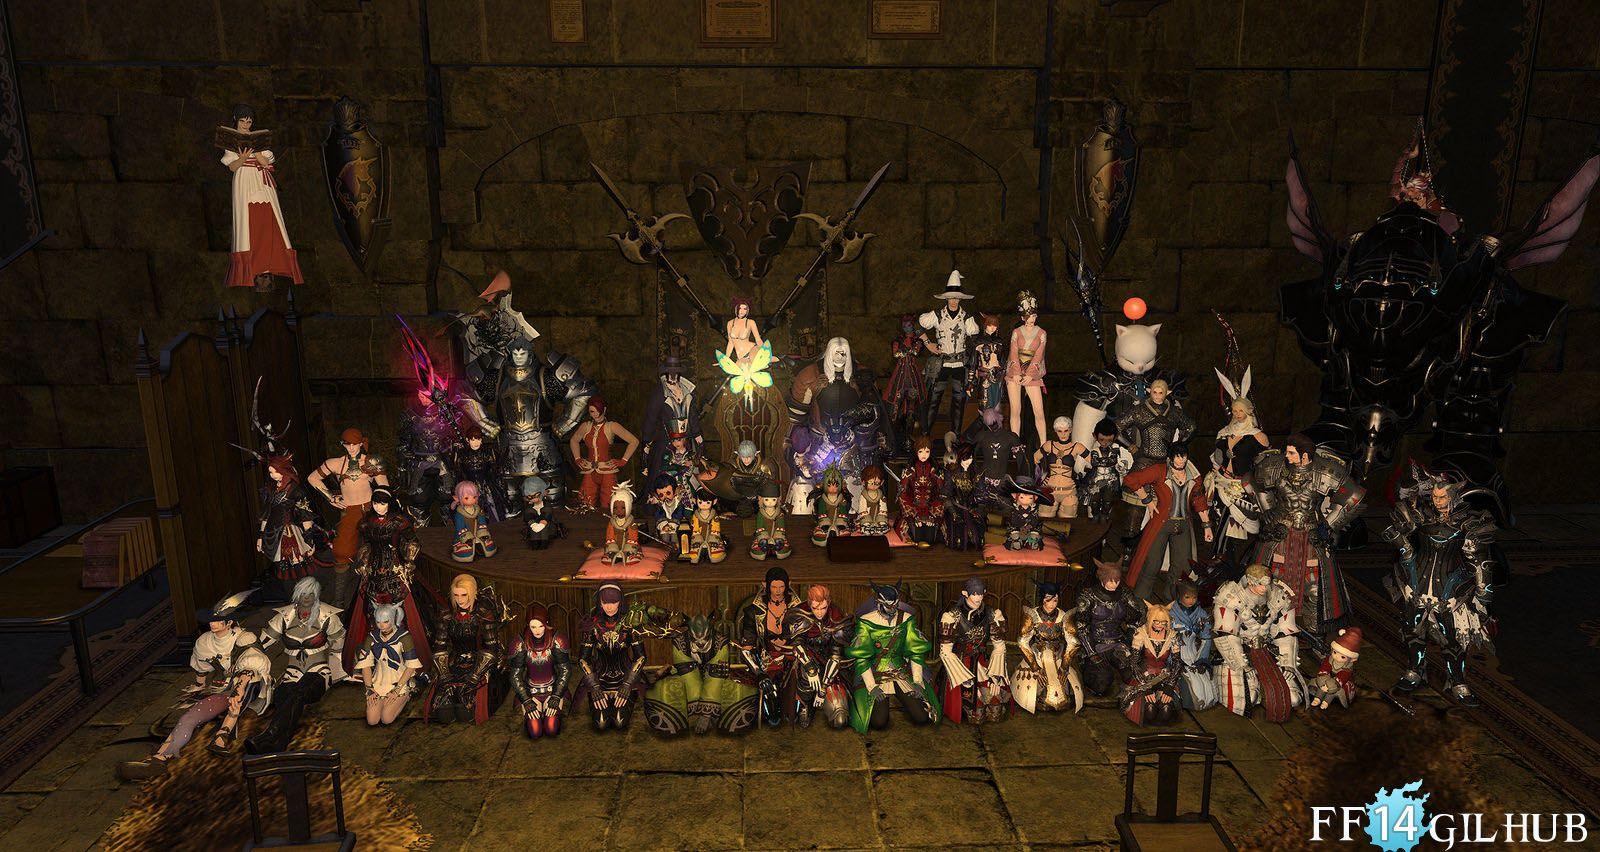 Final Fantasy Xiv Free Companys Themselves Are The Leader S Property Final Fantasy Xiv Final Fantasy Fantasy